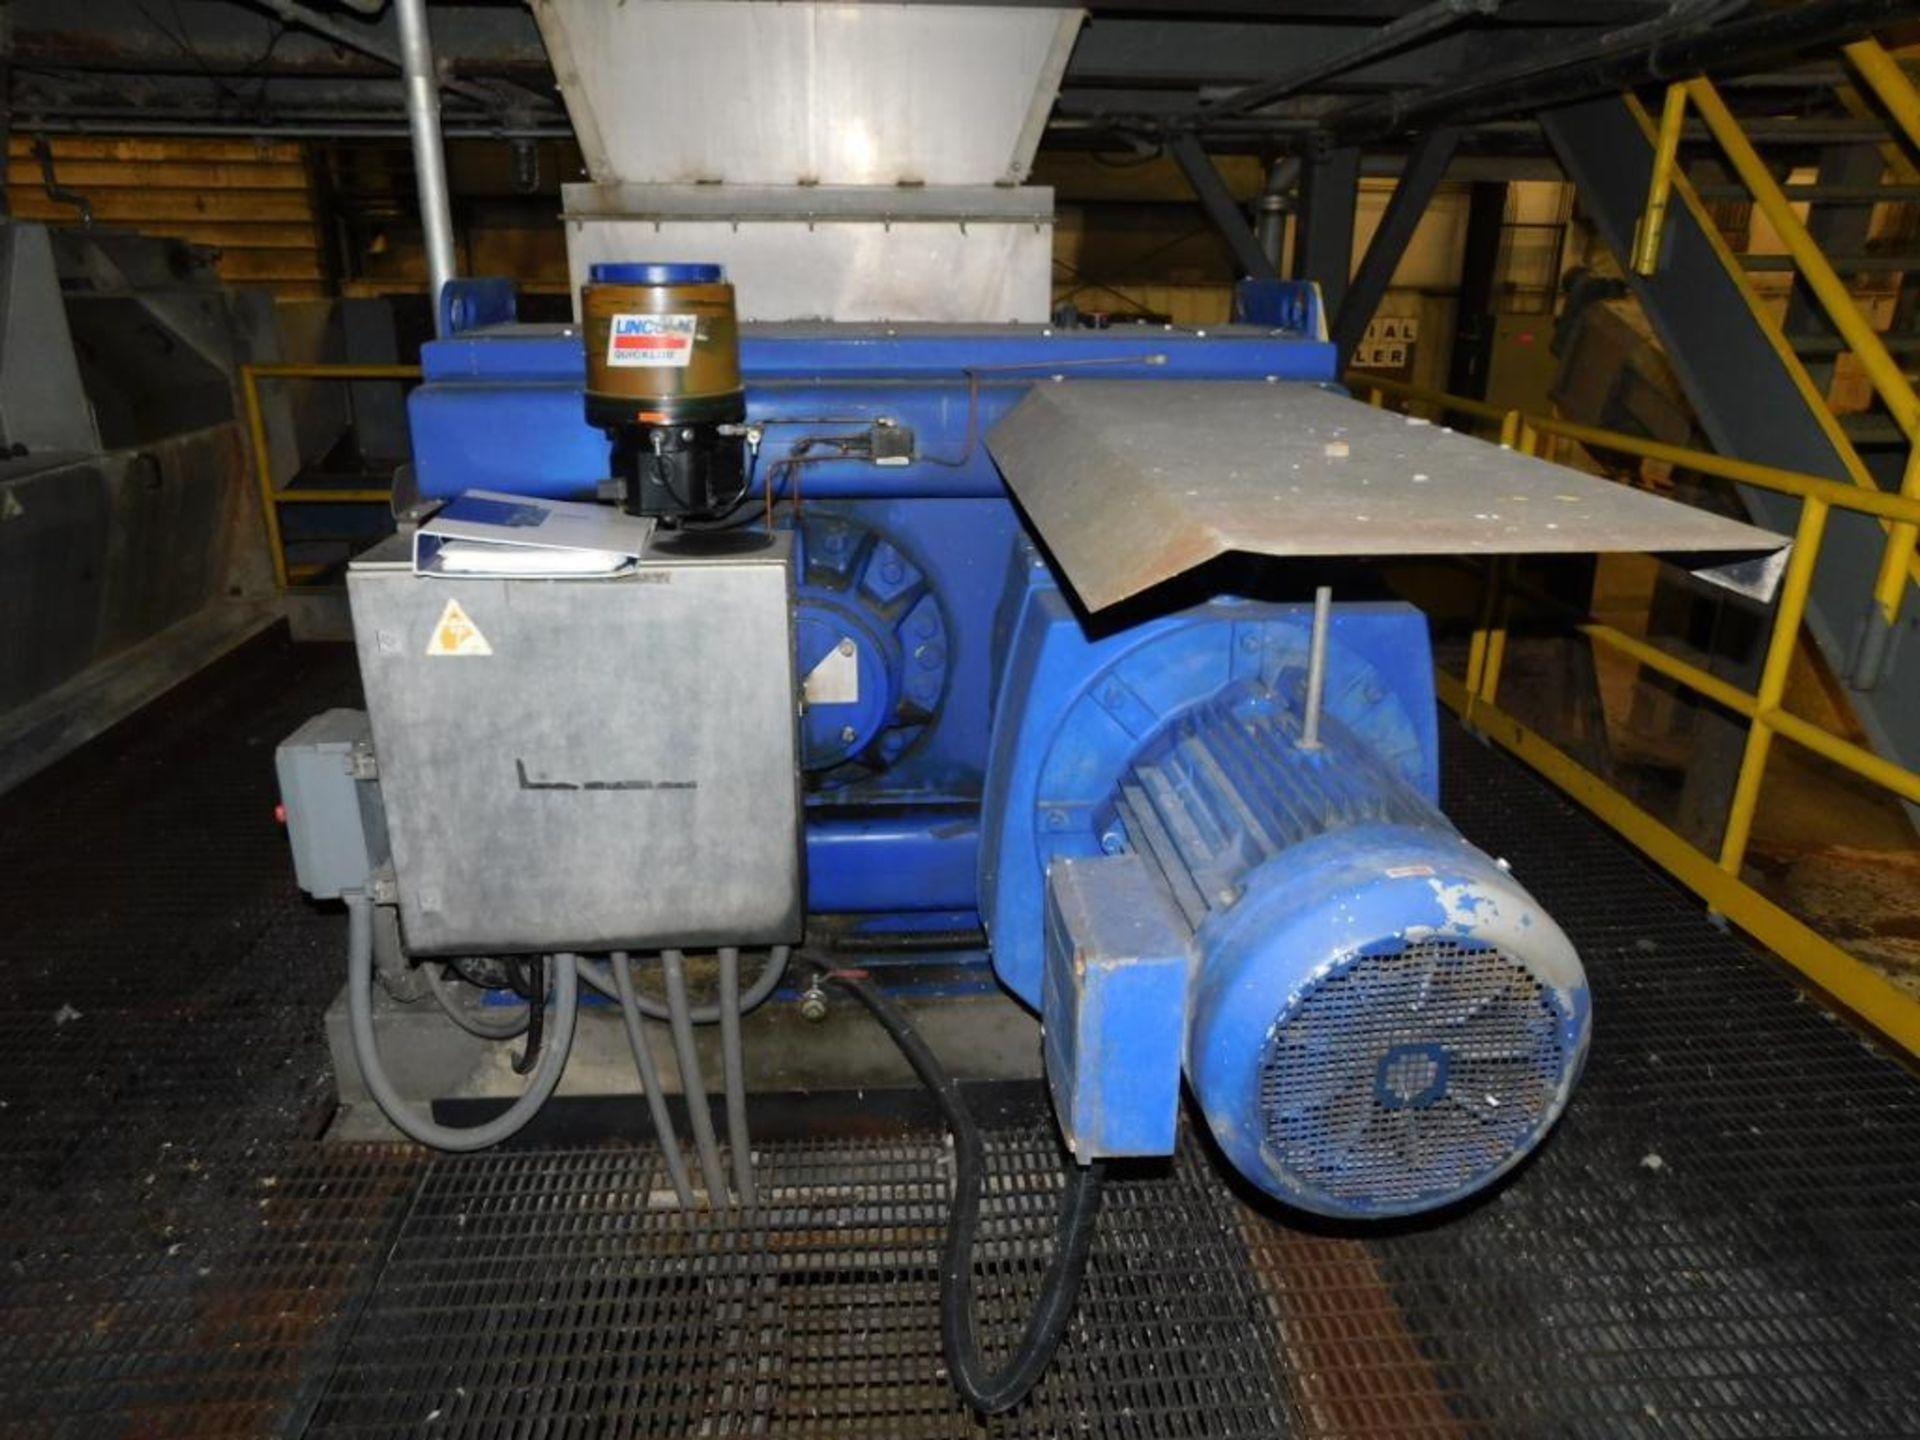 Lot 41 - Trumag/Meri Compax Screw Press Model CFX60R, S/N 11140 (2009), Driven by 30kw Motor (#EC-774-02-023,